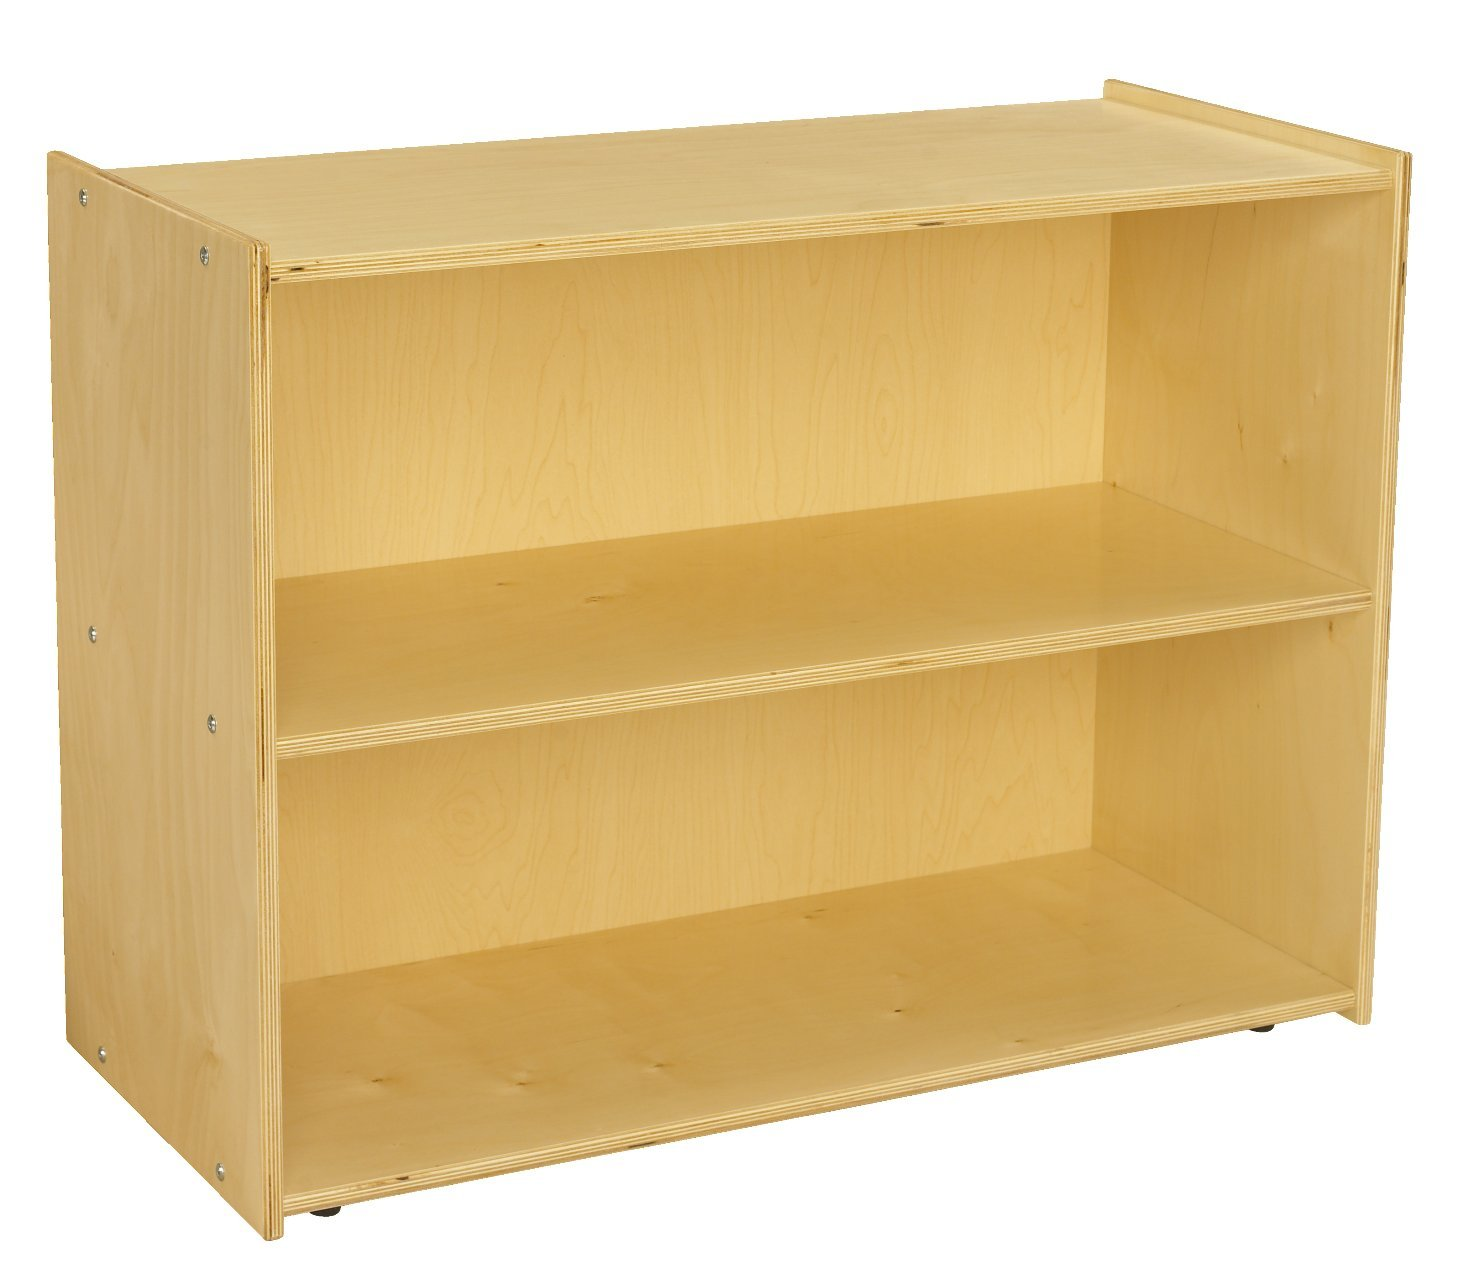 Childcraft 1526314 ABC Furnishings Deep Shelf Storage Units, 27.38'' Height, 16'' Width, 36'' Length, Natural Wood